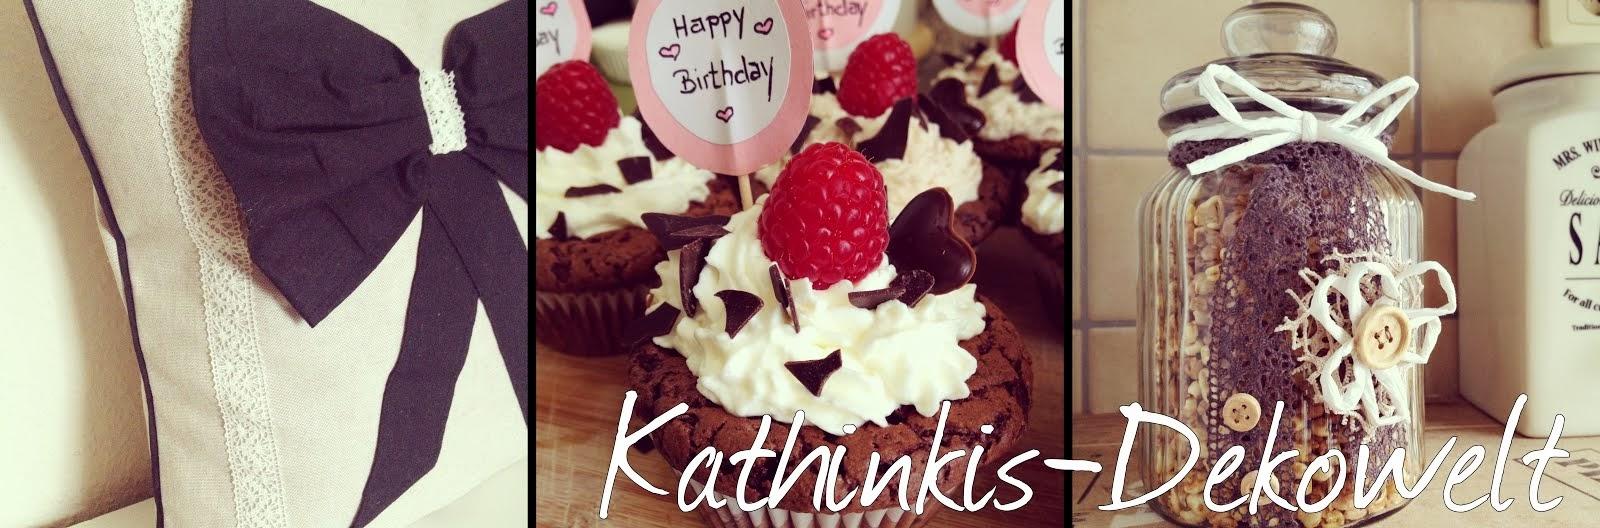 Kathinkis-Dekowelt